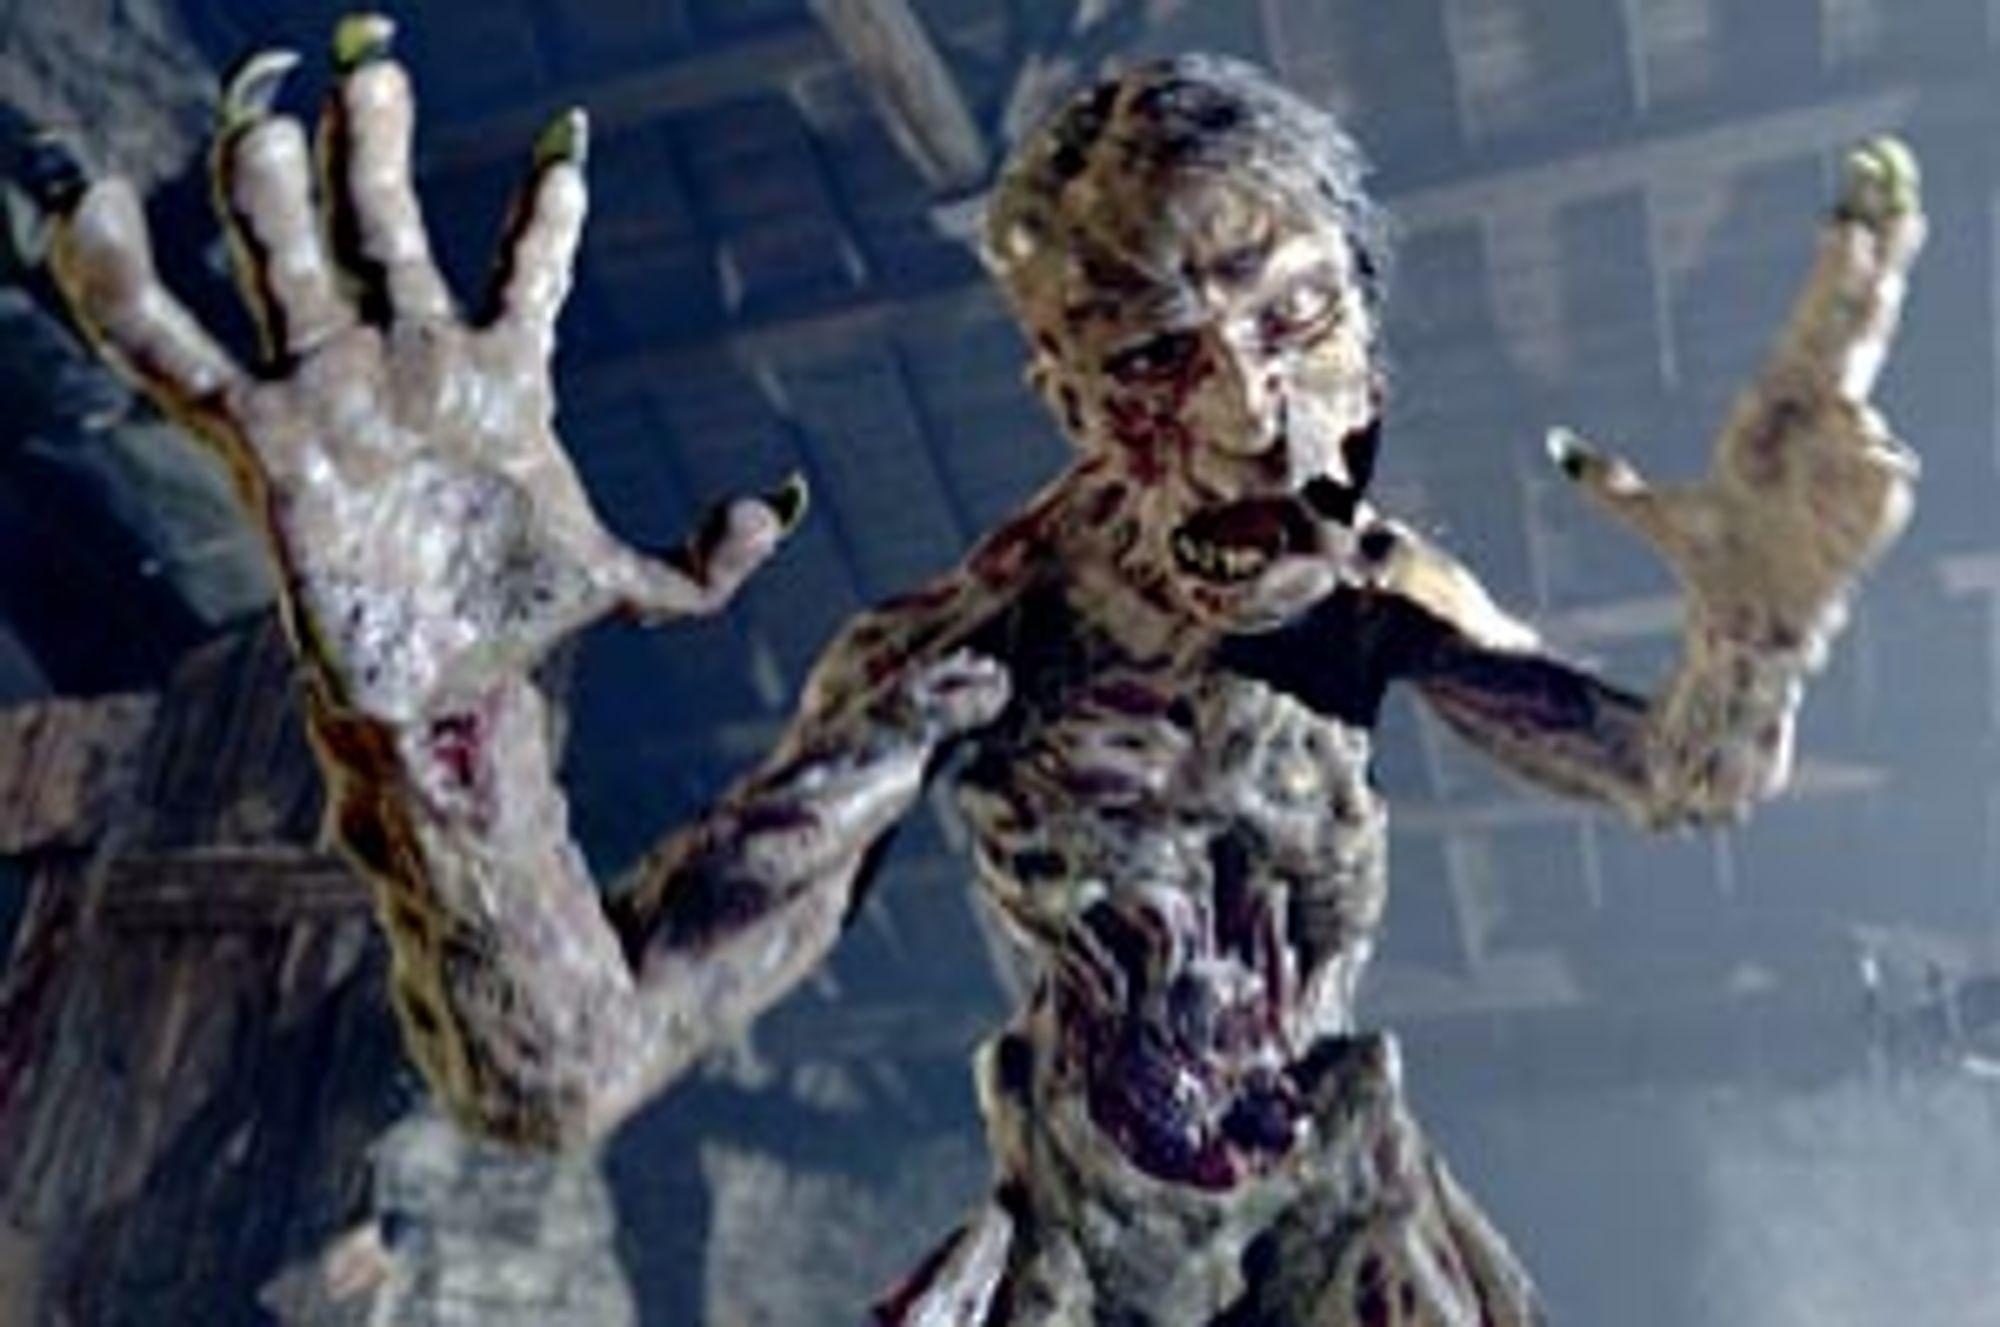 Grendel, det onde fiske-zombie-menneske-dyre-monsteret i all sin prakt.